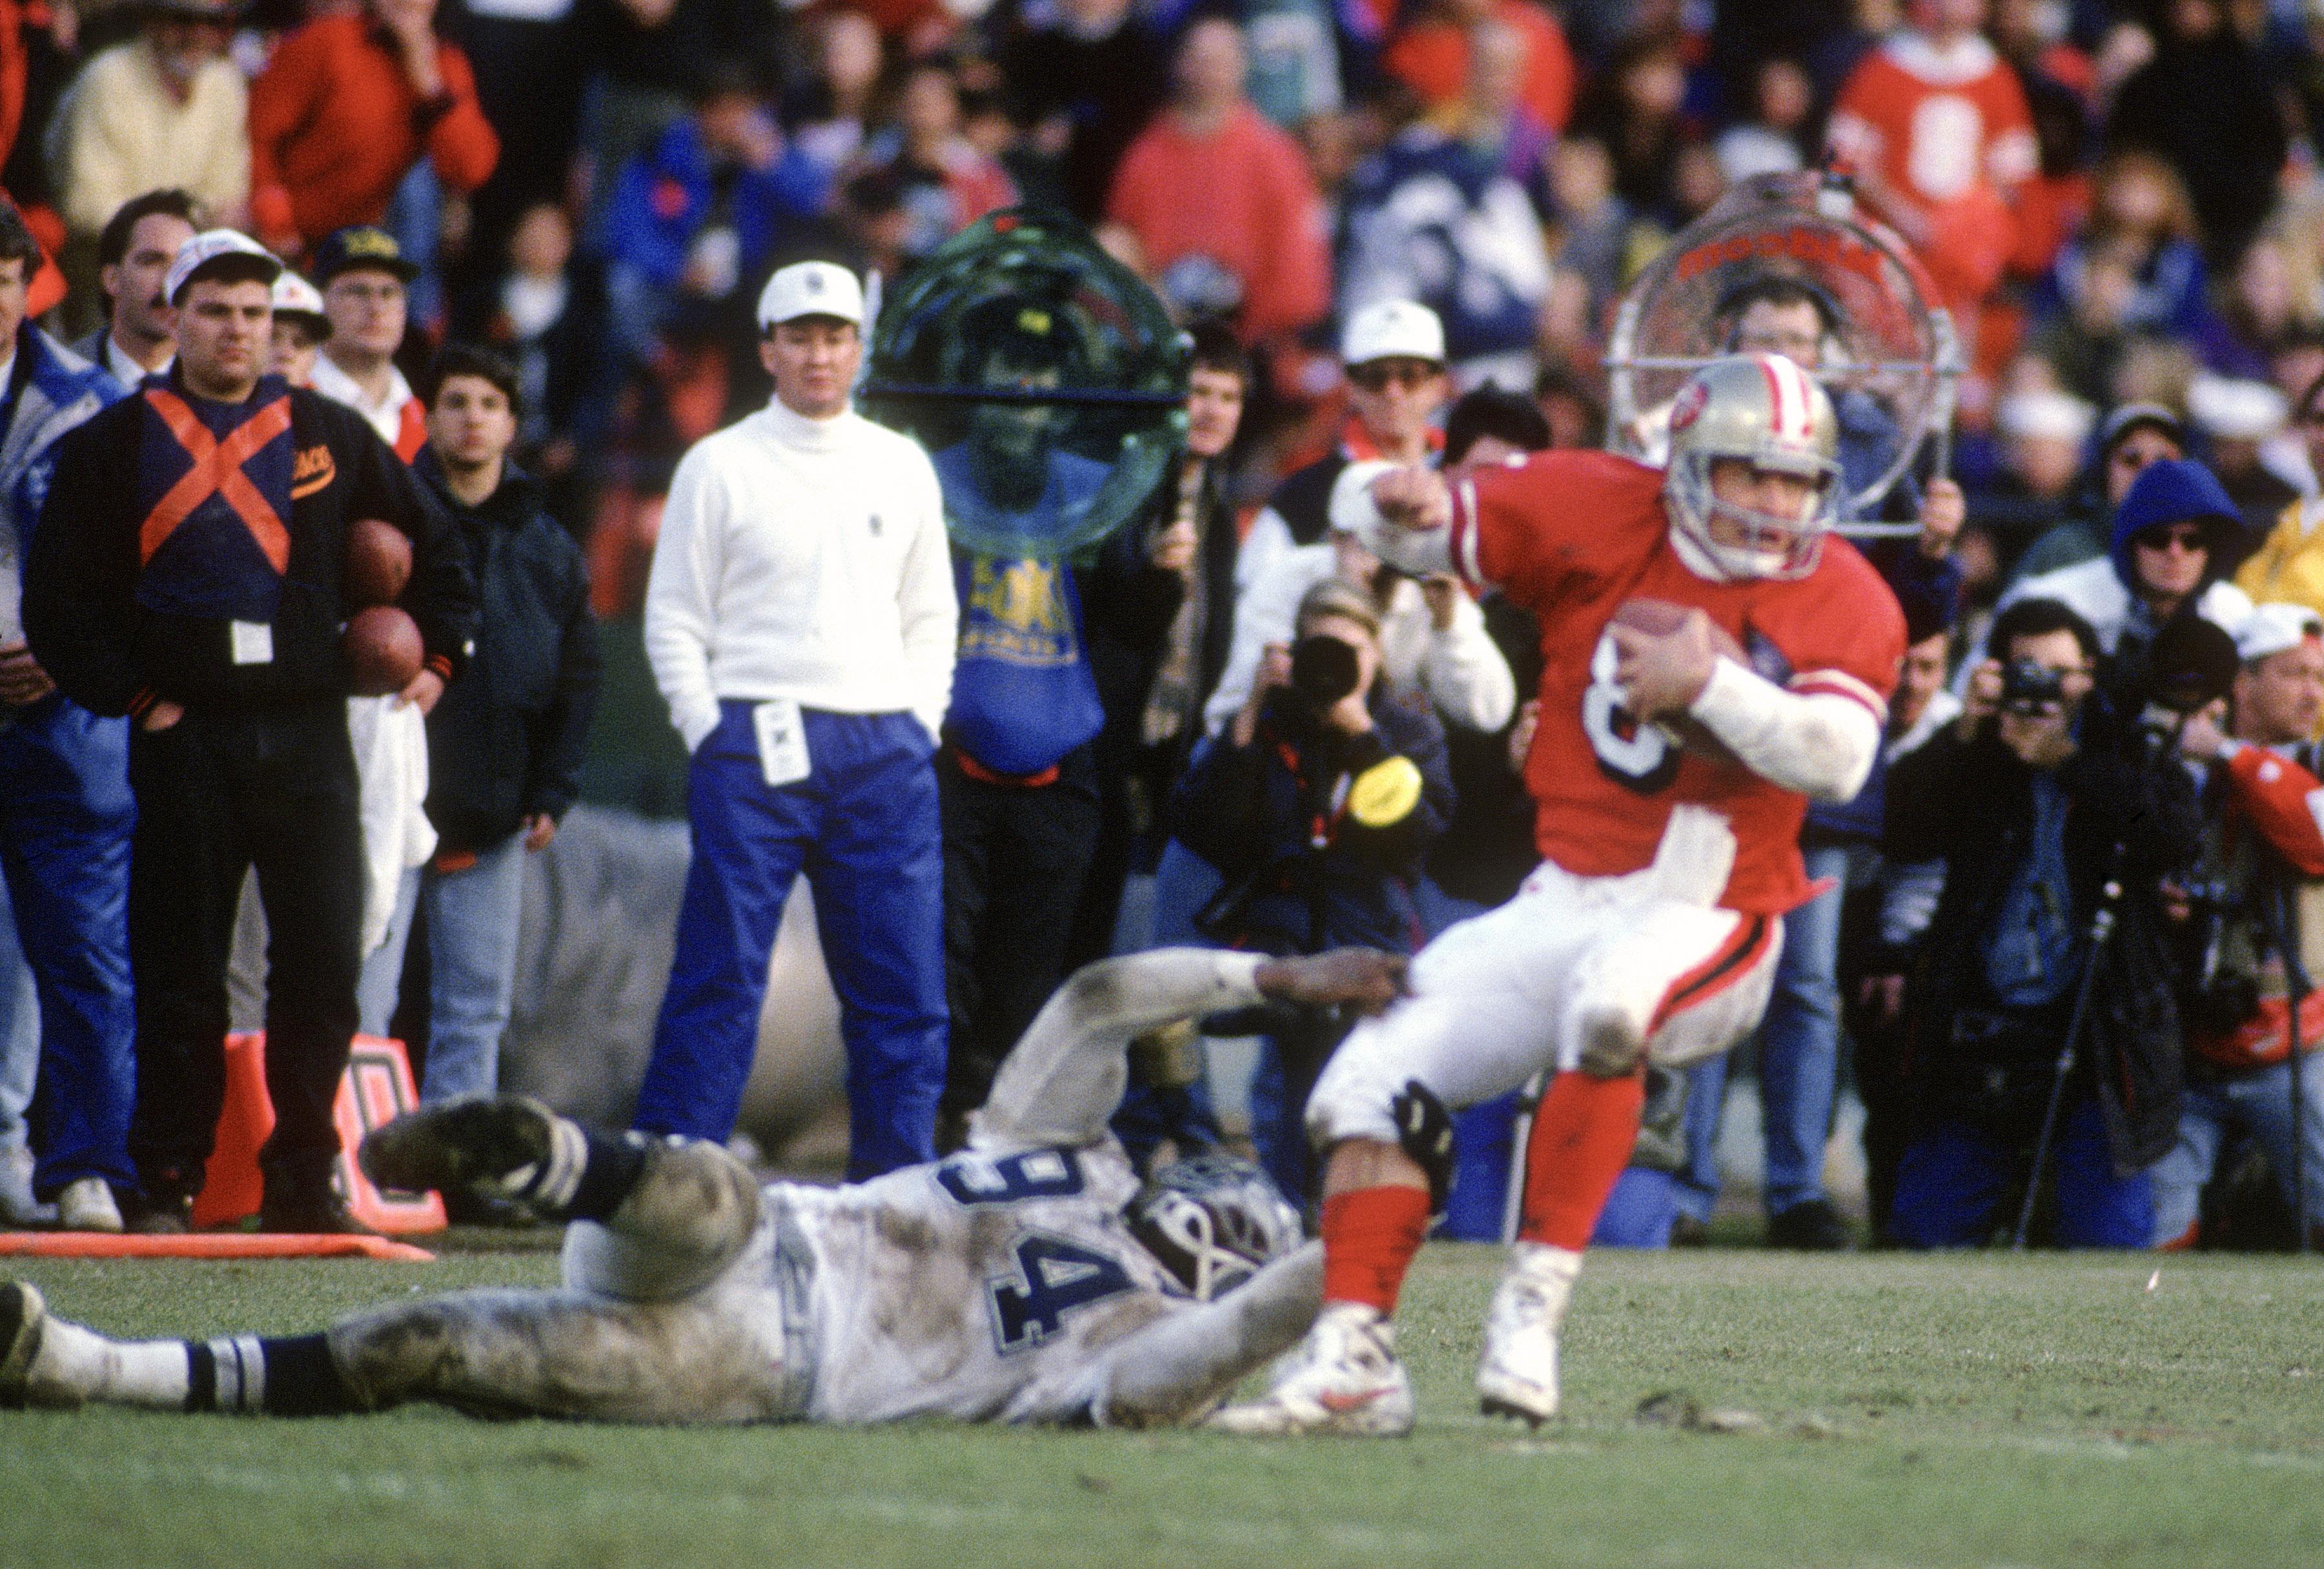 NFC Conference Championship - Dallas Cowboys v San Francisco 49ers